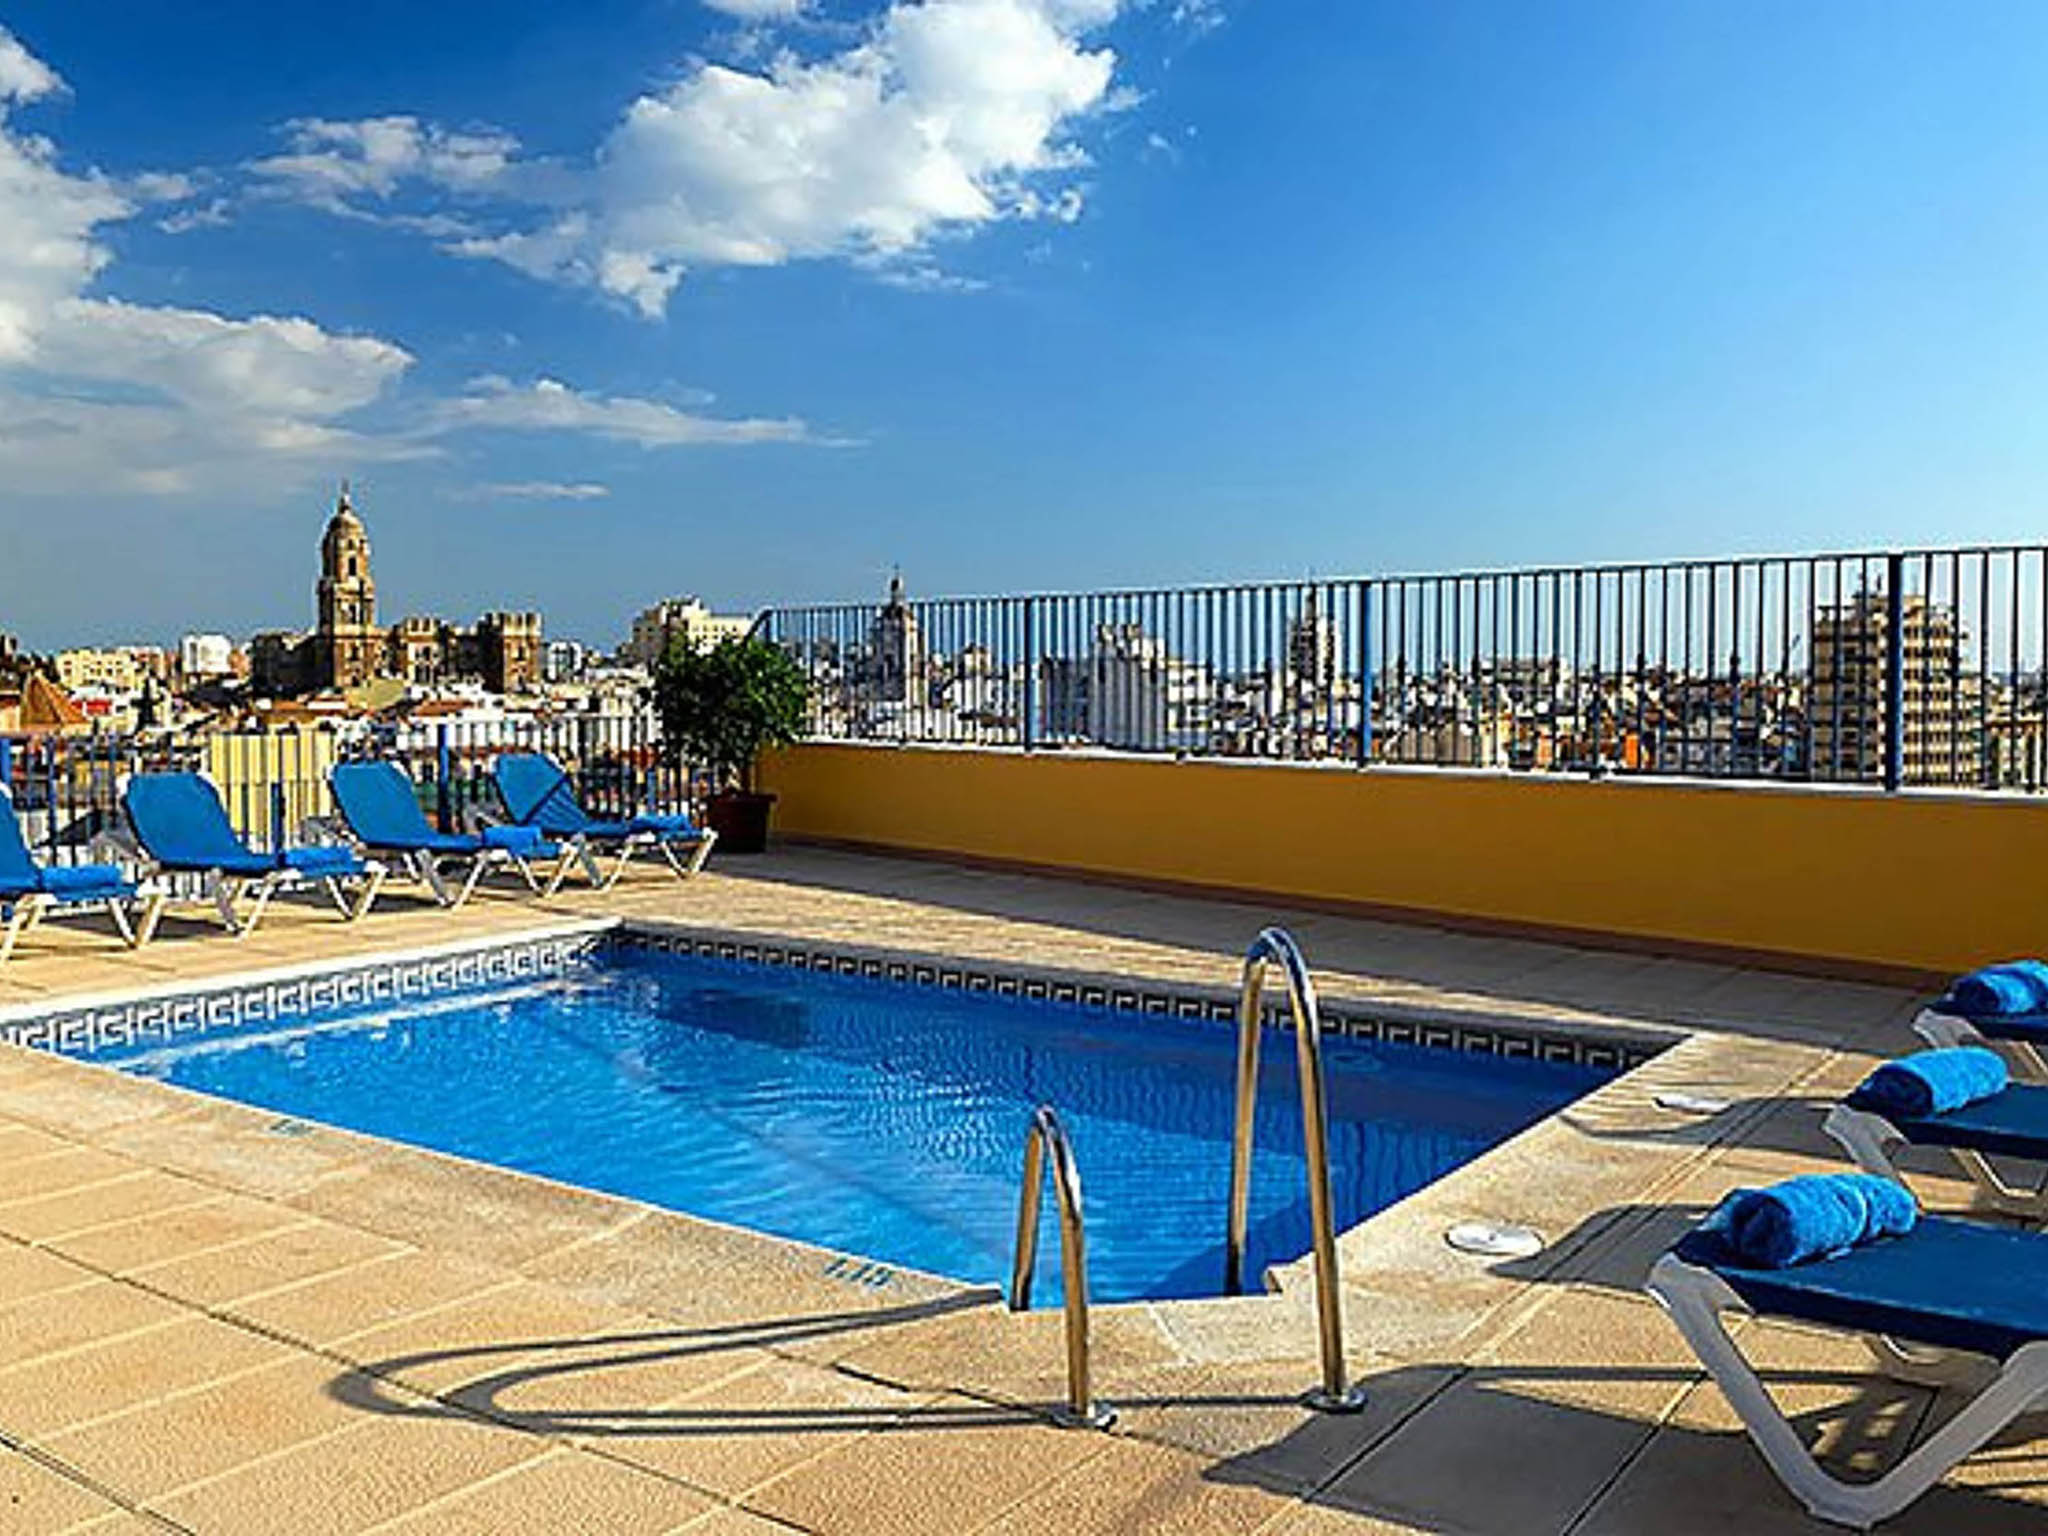 Ibis Hotel Malaga City